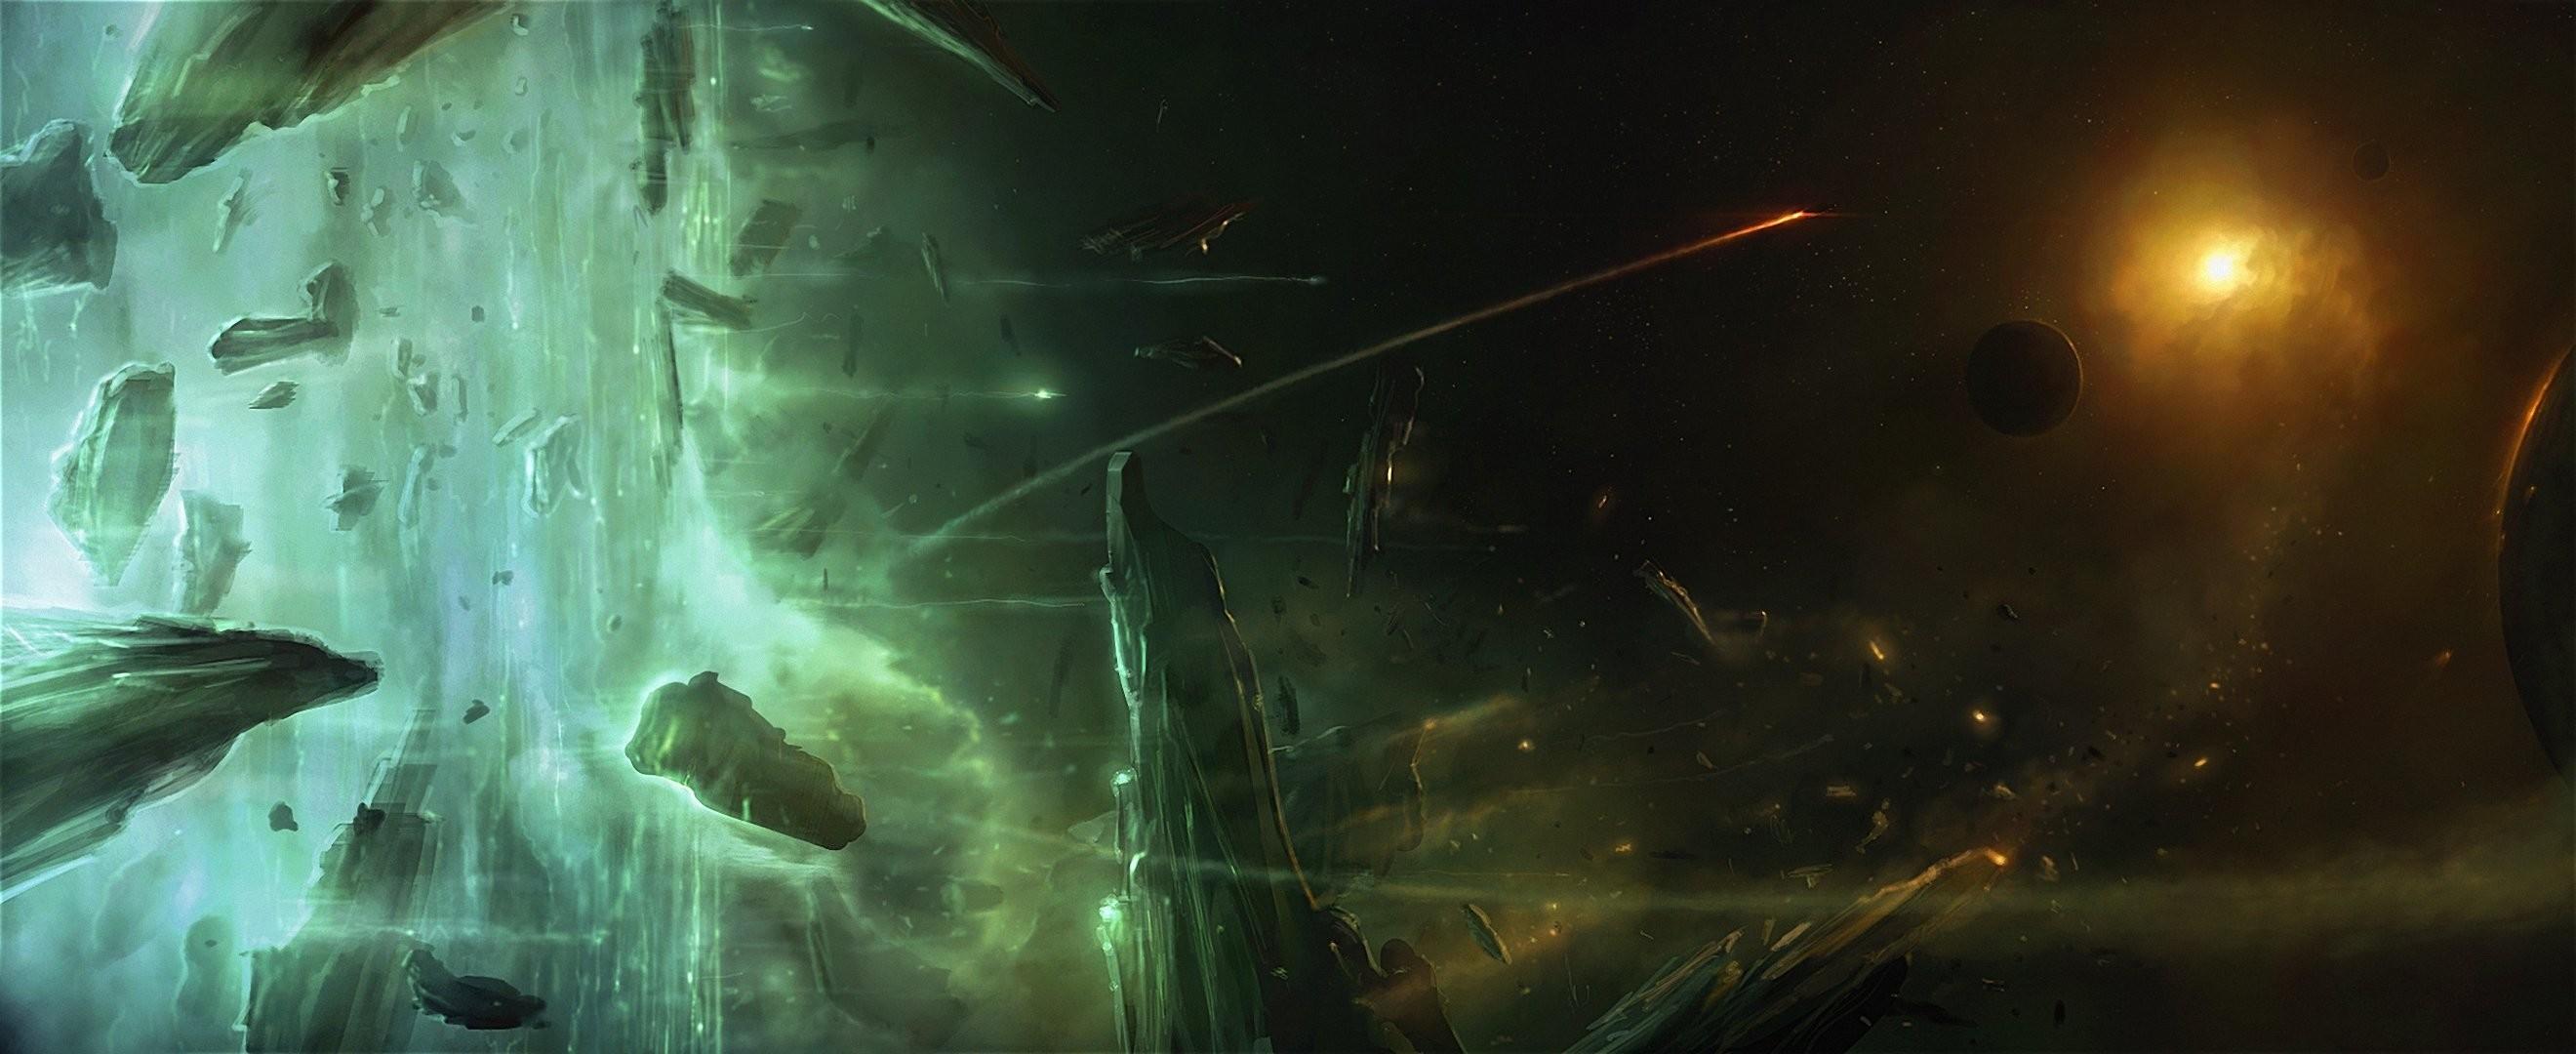 art ashley barley elite dangerous space asteroids stones meteorites star  world ships